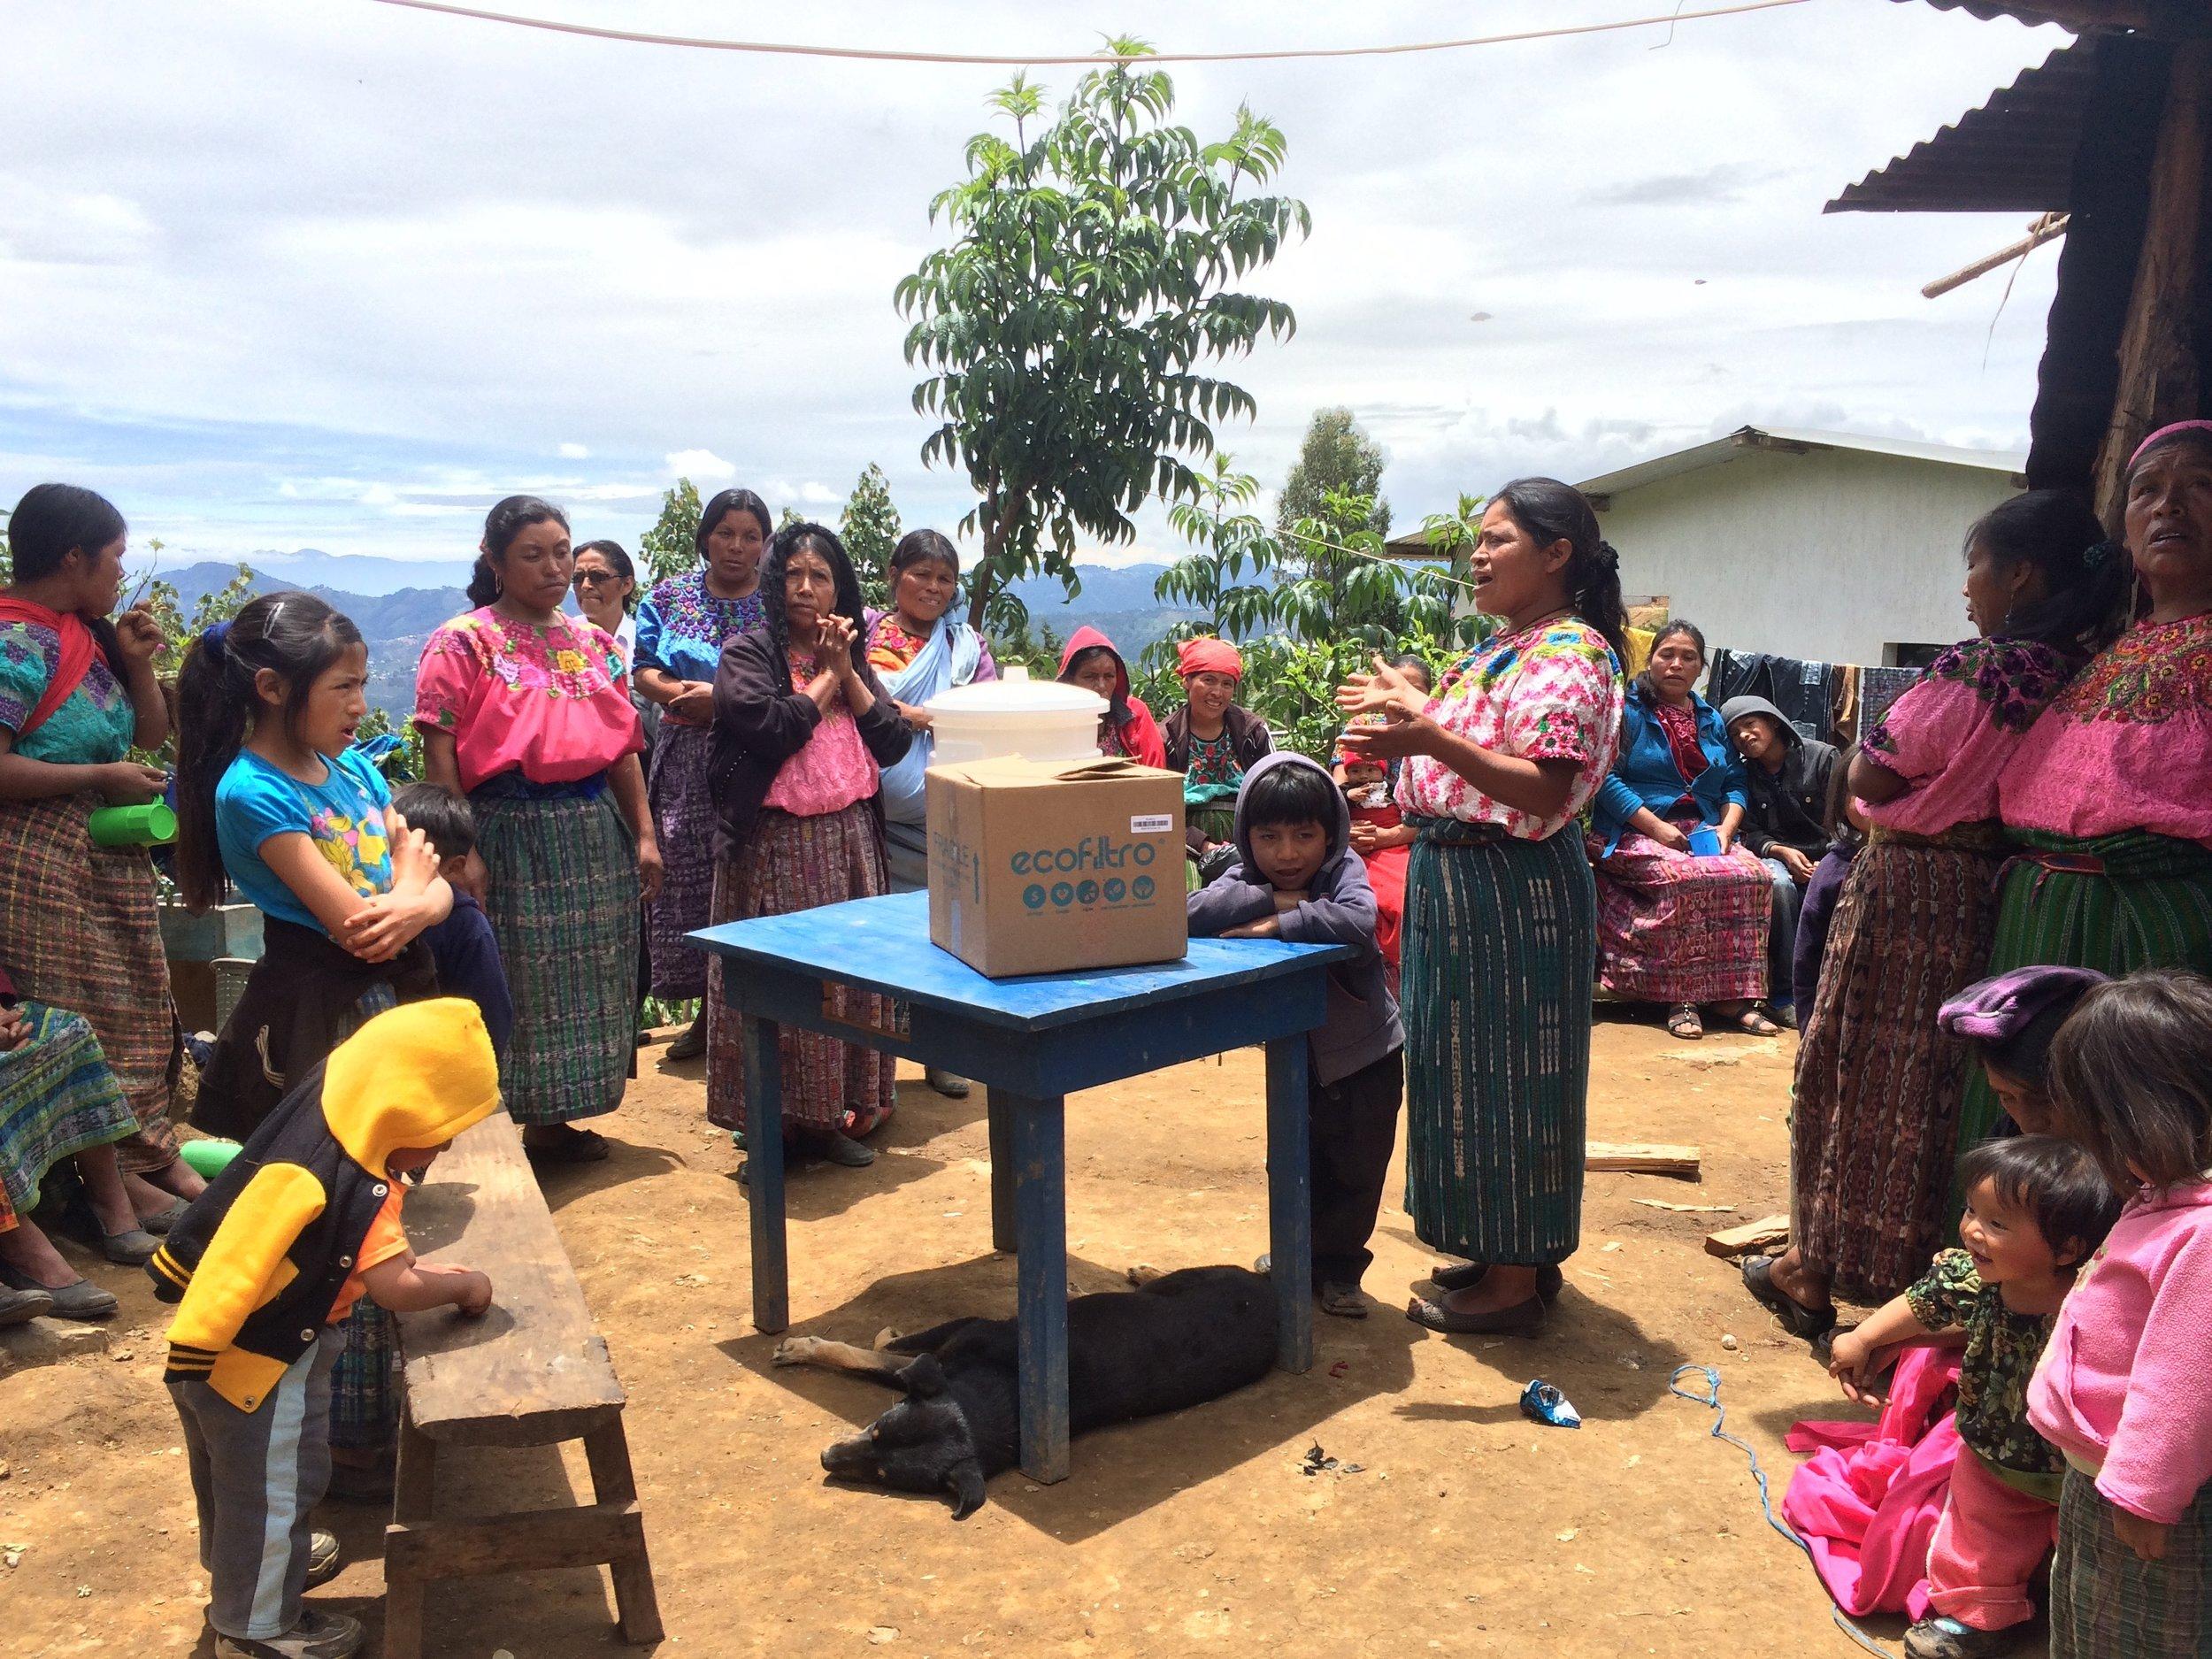 Photo taken during Cornell University's GROW internship in Guatemala (2015).